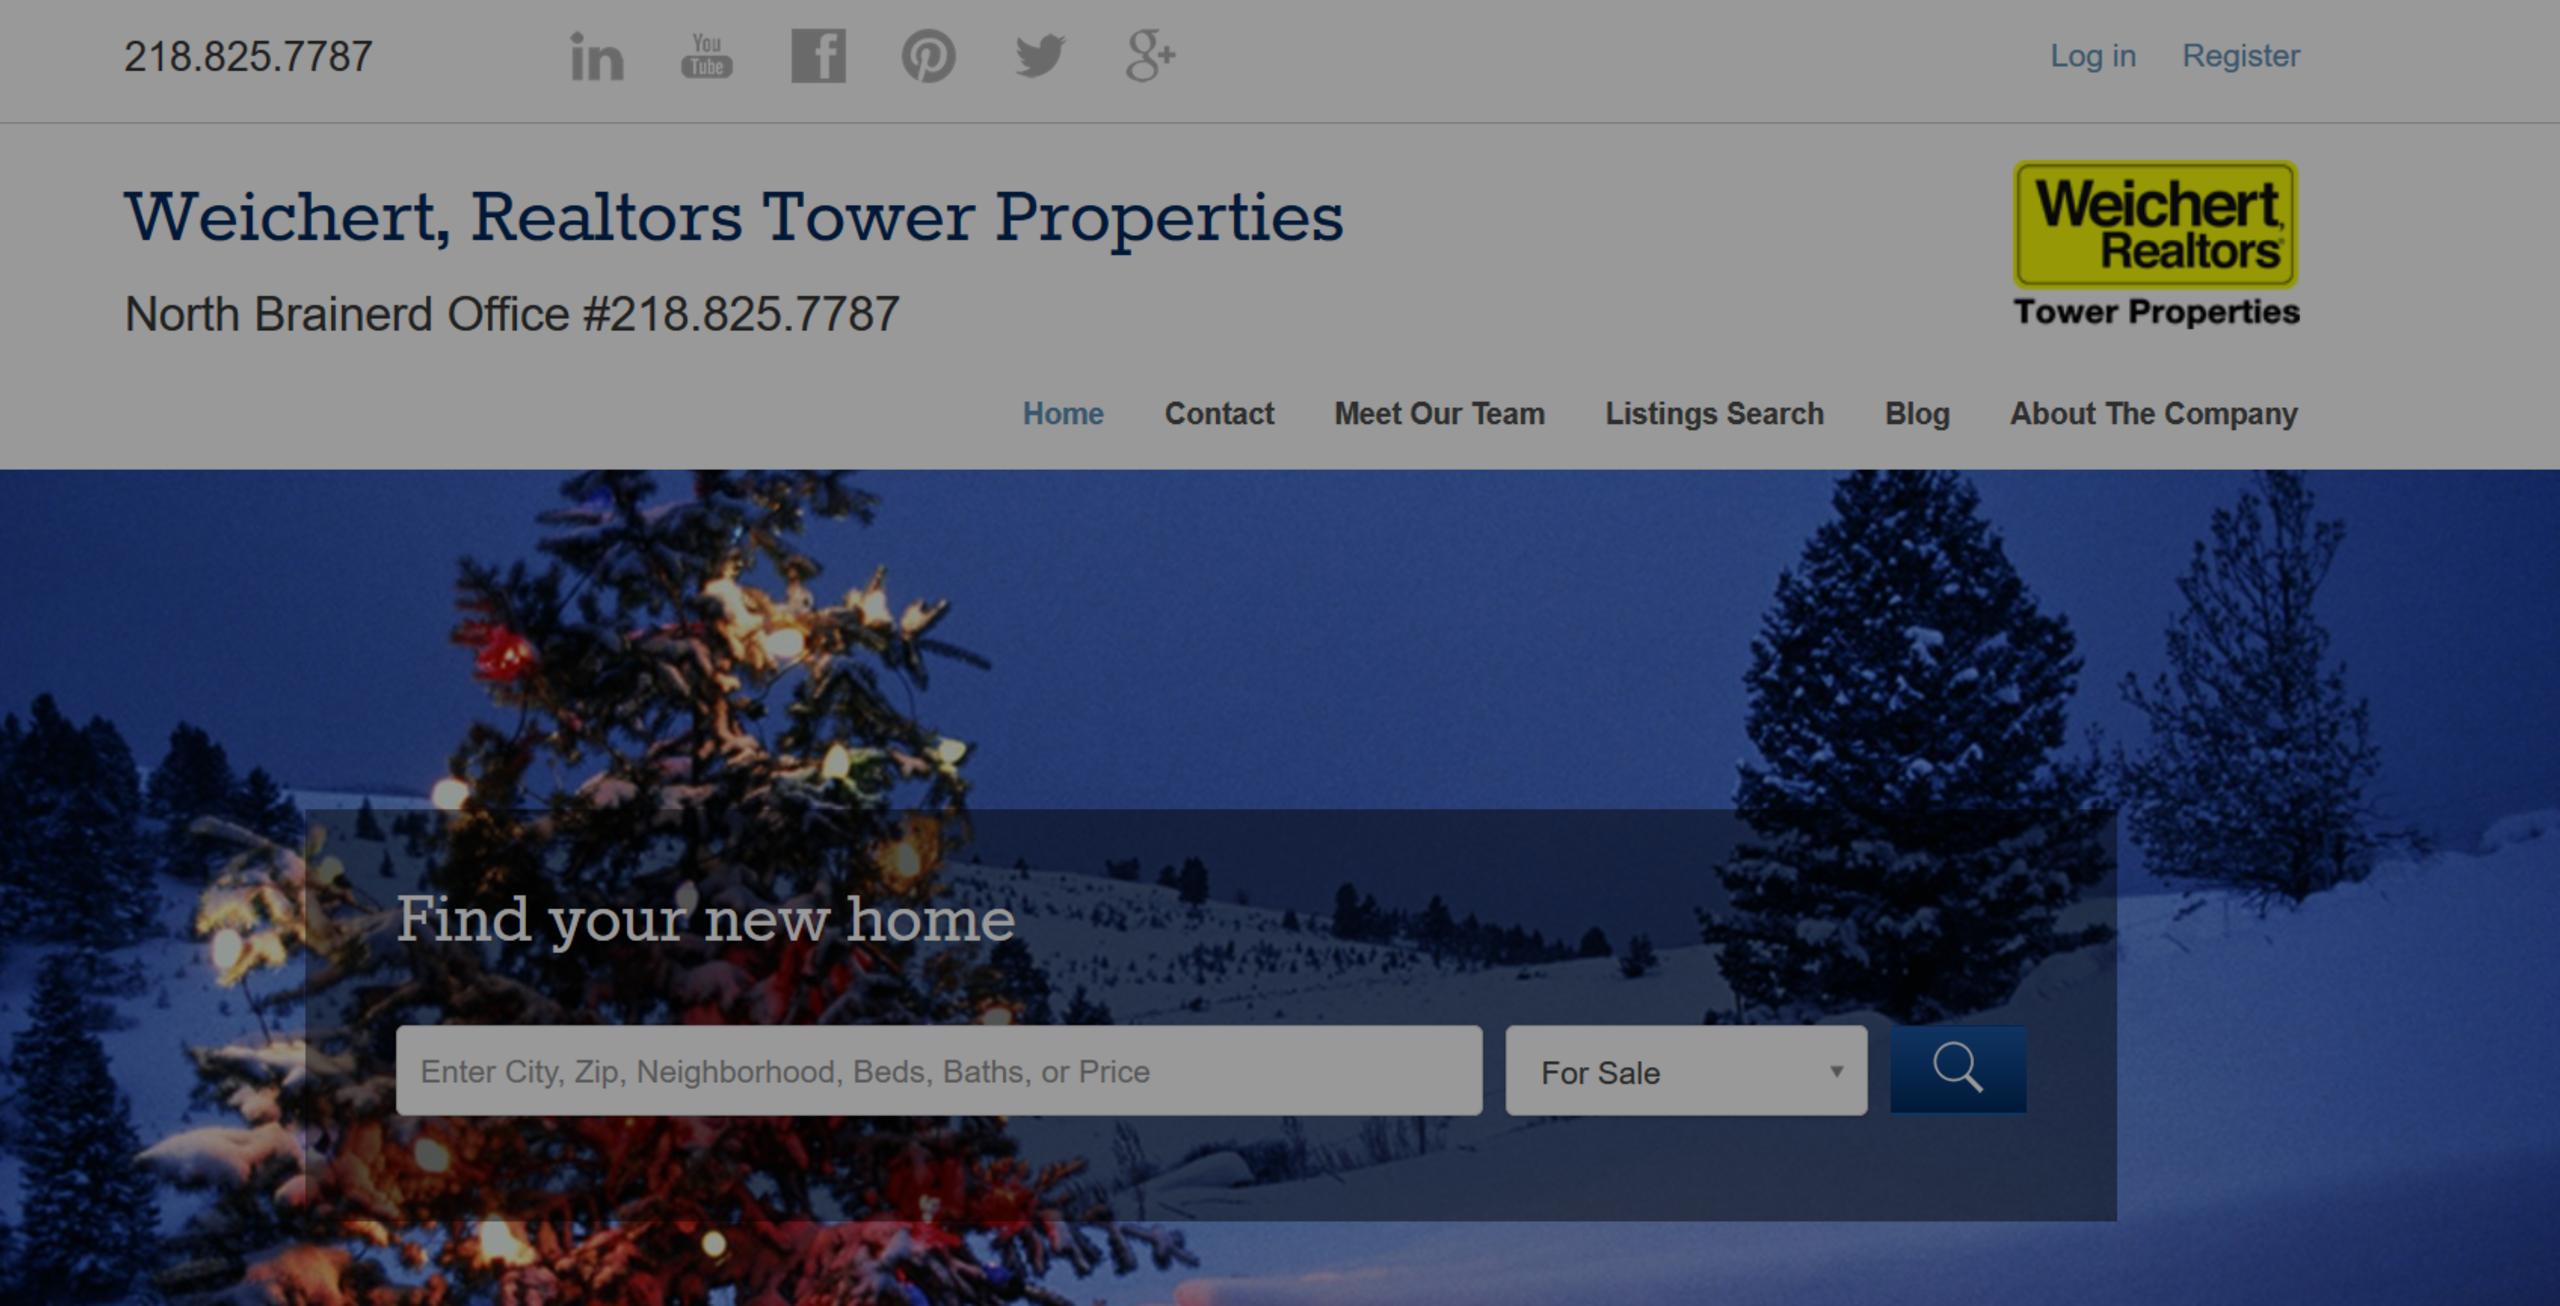 Weichert Realtors Tower Properties Brainered …You wont believe it!